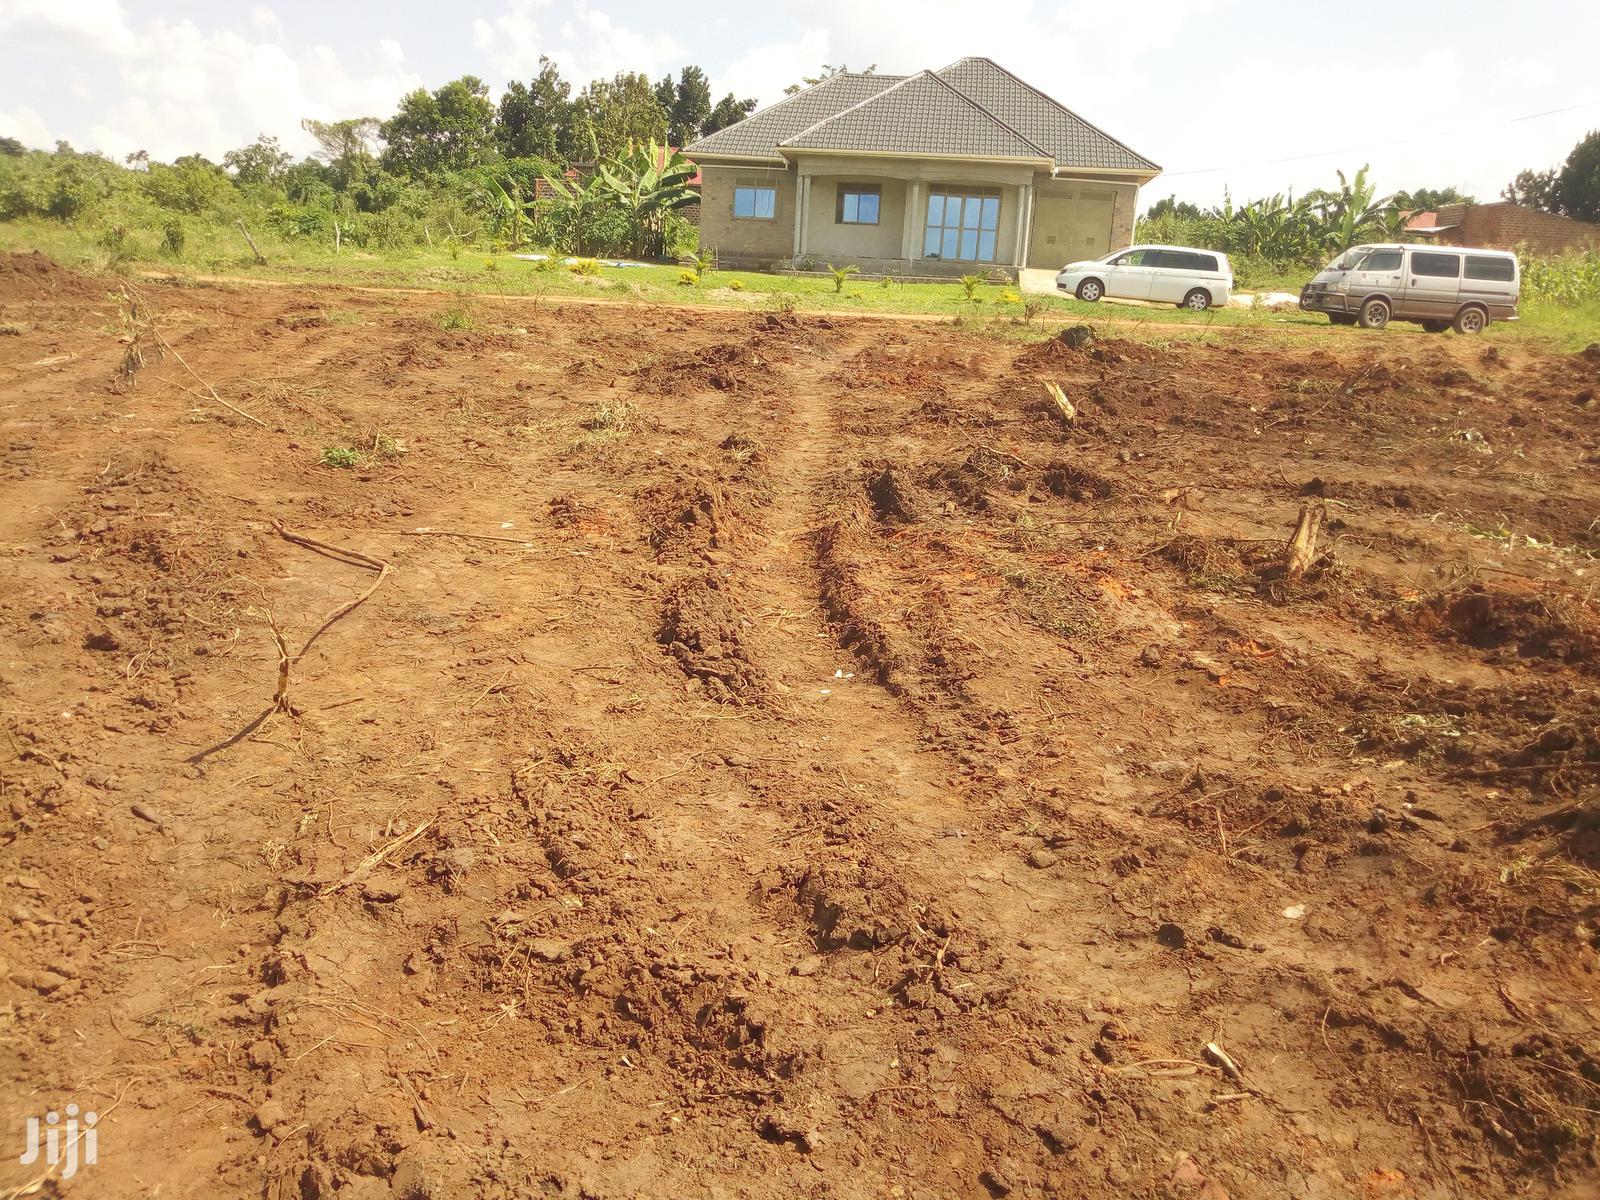 Estate at Matugga Busikiri for KATS AND DEO SURVEYS LTD